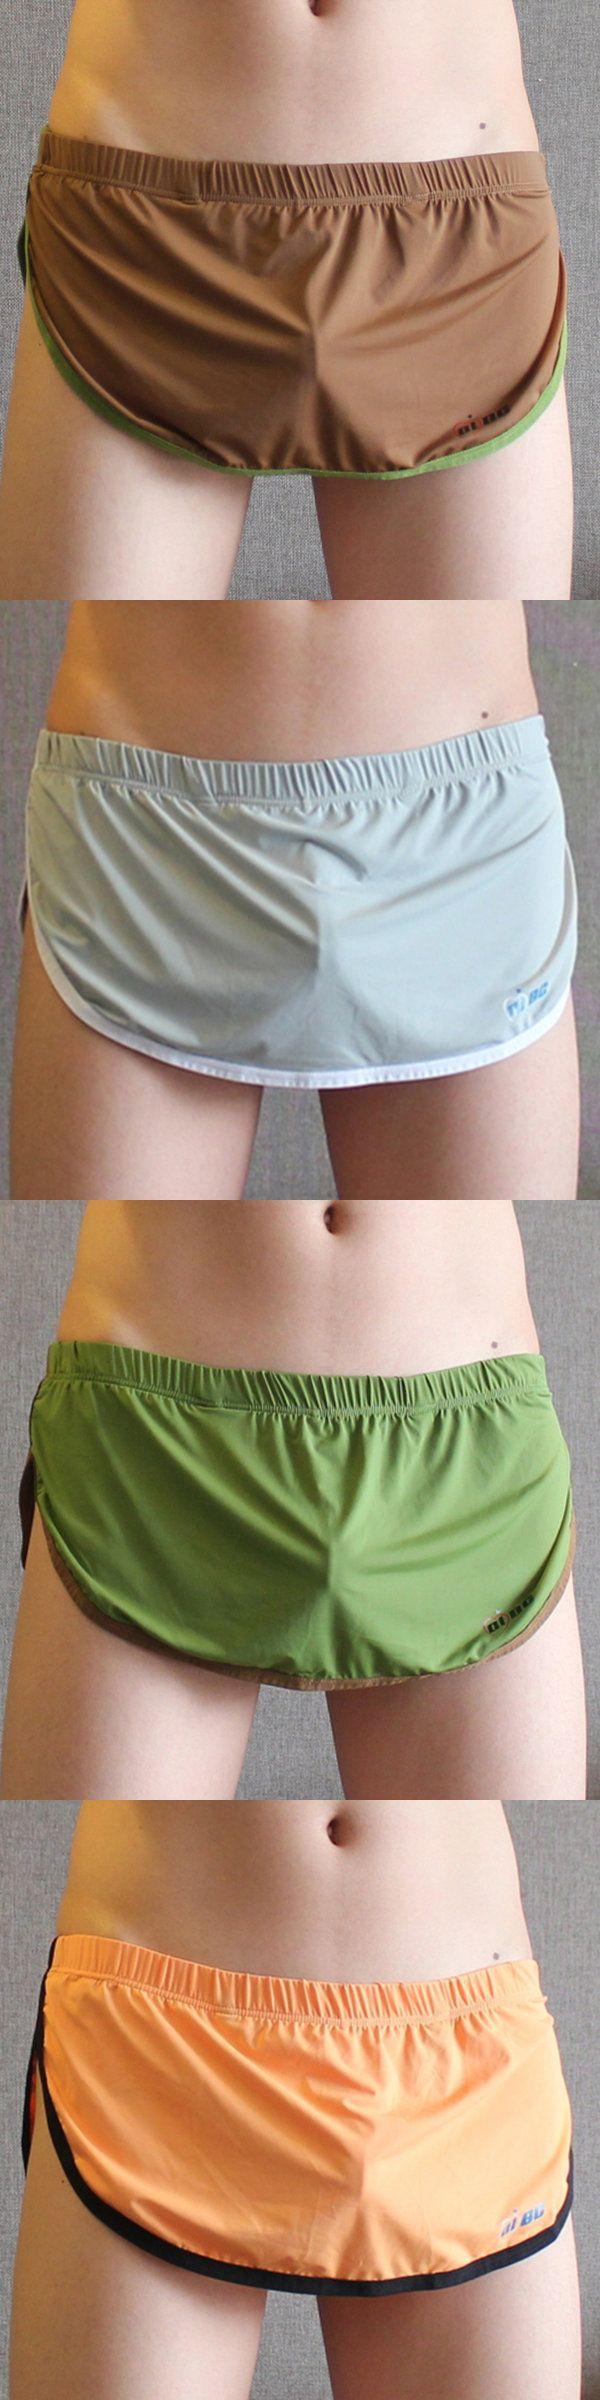 Home Sexy Thongs Sleepwear Breathable Seamless Underwear for Men